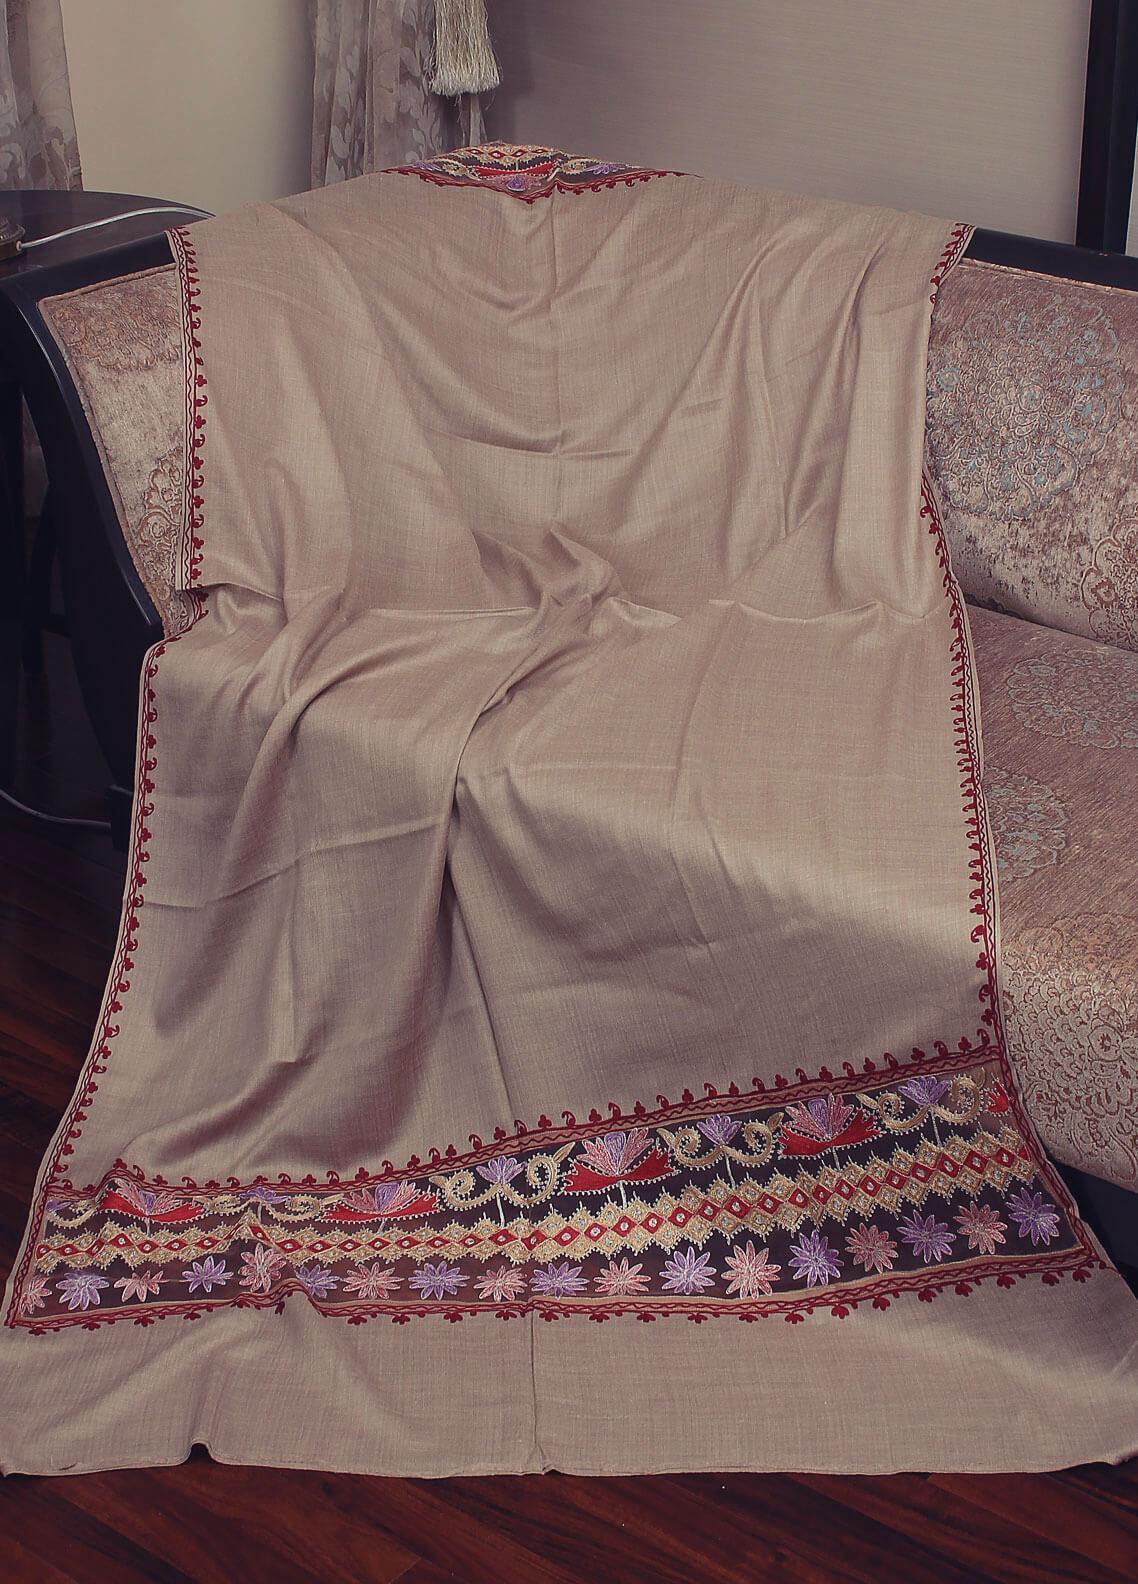 Sanaulla Exclusive Range Cut Work Embroidered Pashmina  Shawl 19-MIR-380 Beige - Kashmiri Shawls